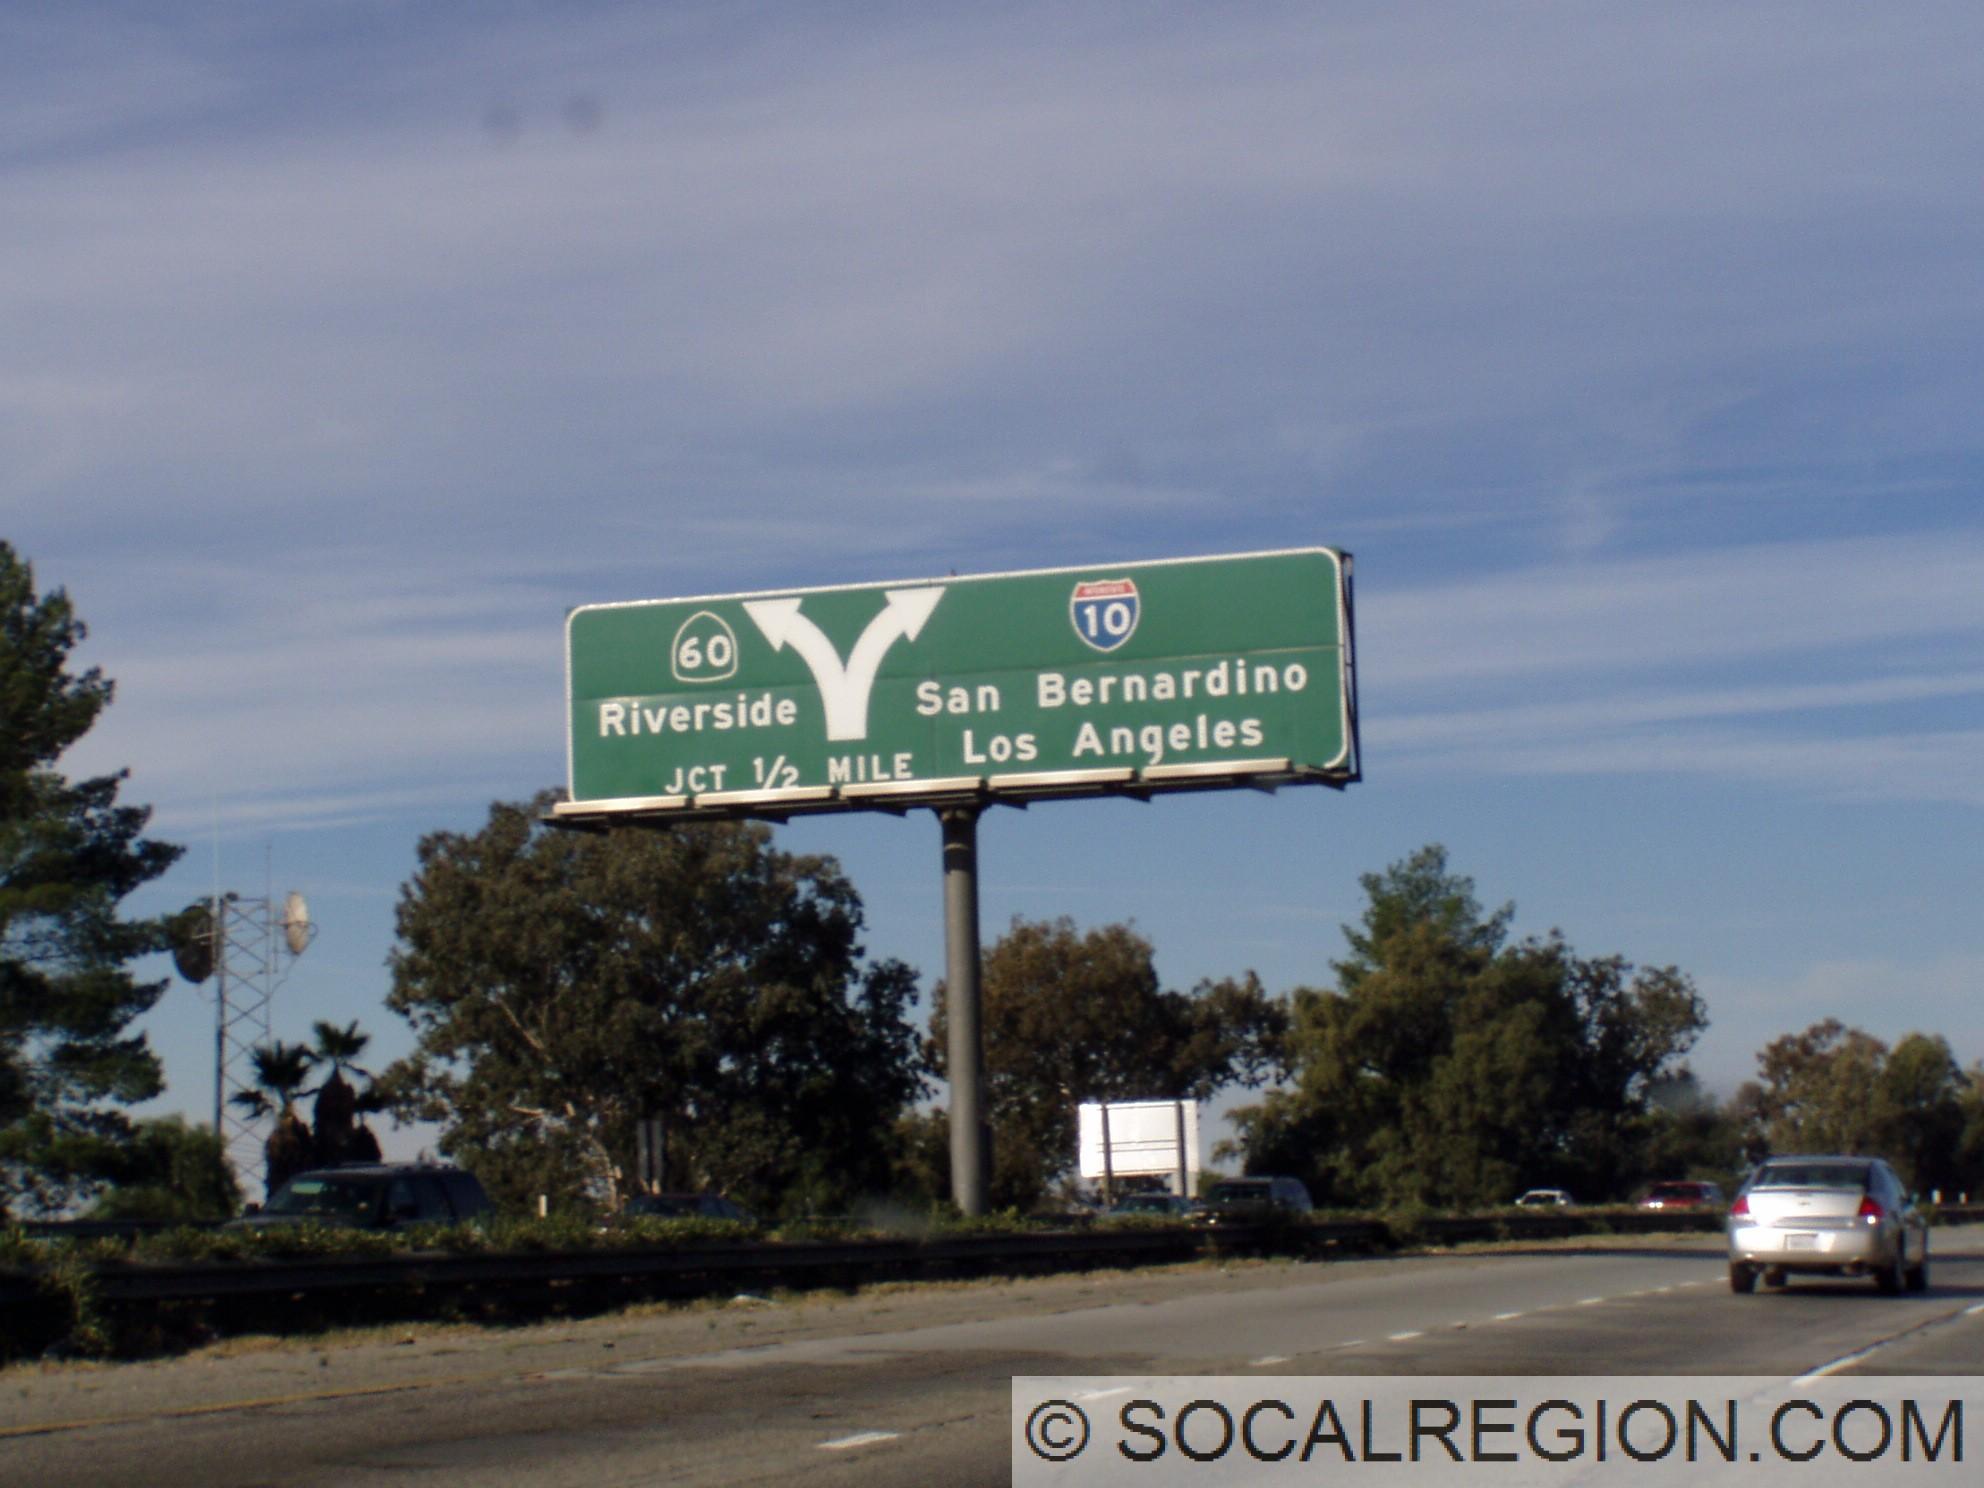 I 10 santa monica san bernardino redlands freeway southern a rare diagrammatic sign at the 60 split sciox Choice Image